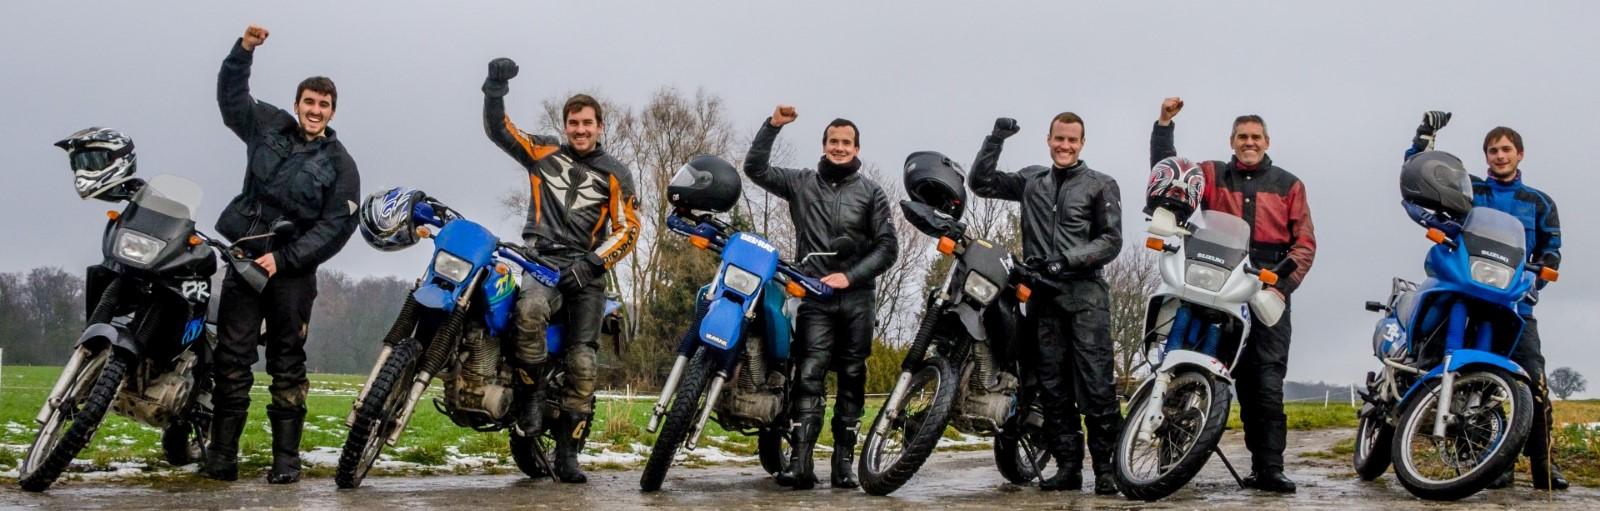 Jeremy, Matthias, Fabian, Johannes, Michael, Markus - Startnummer 49